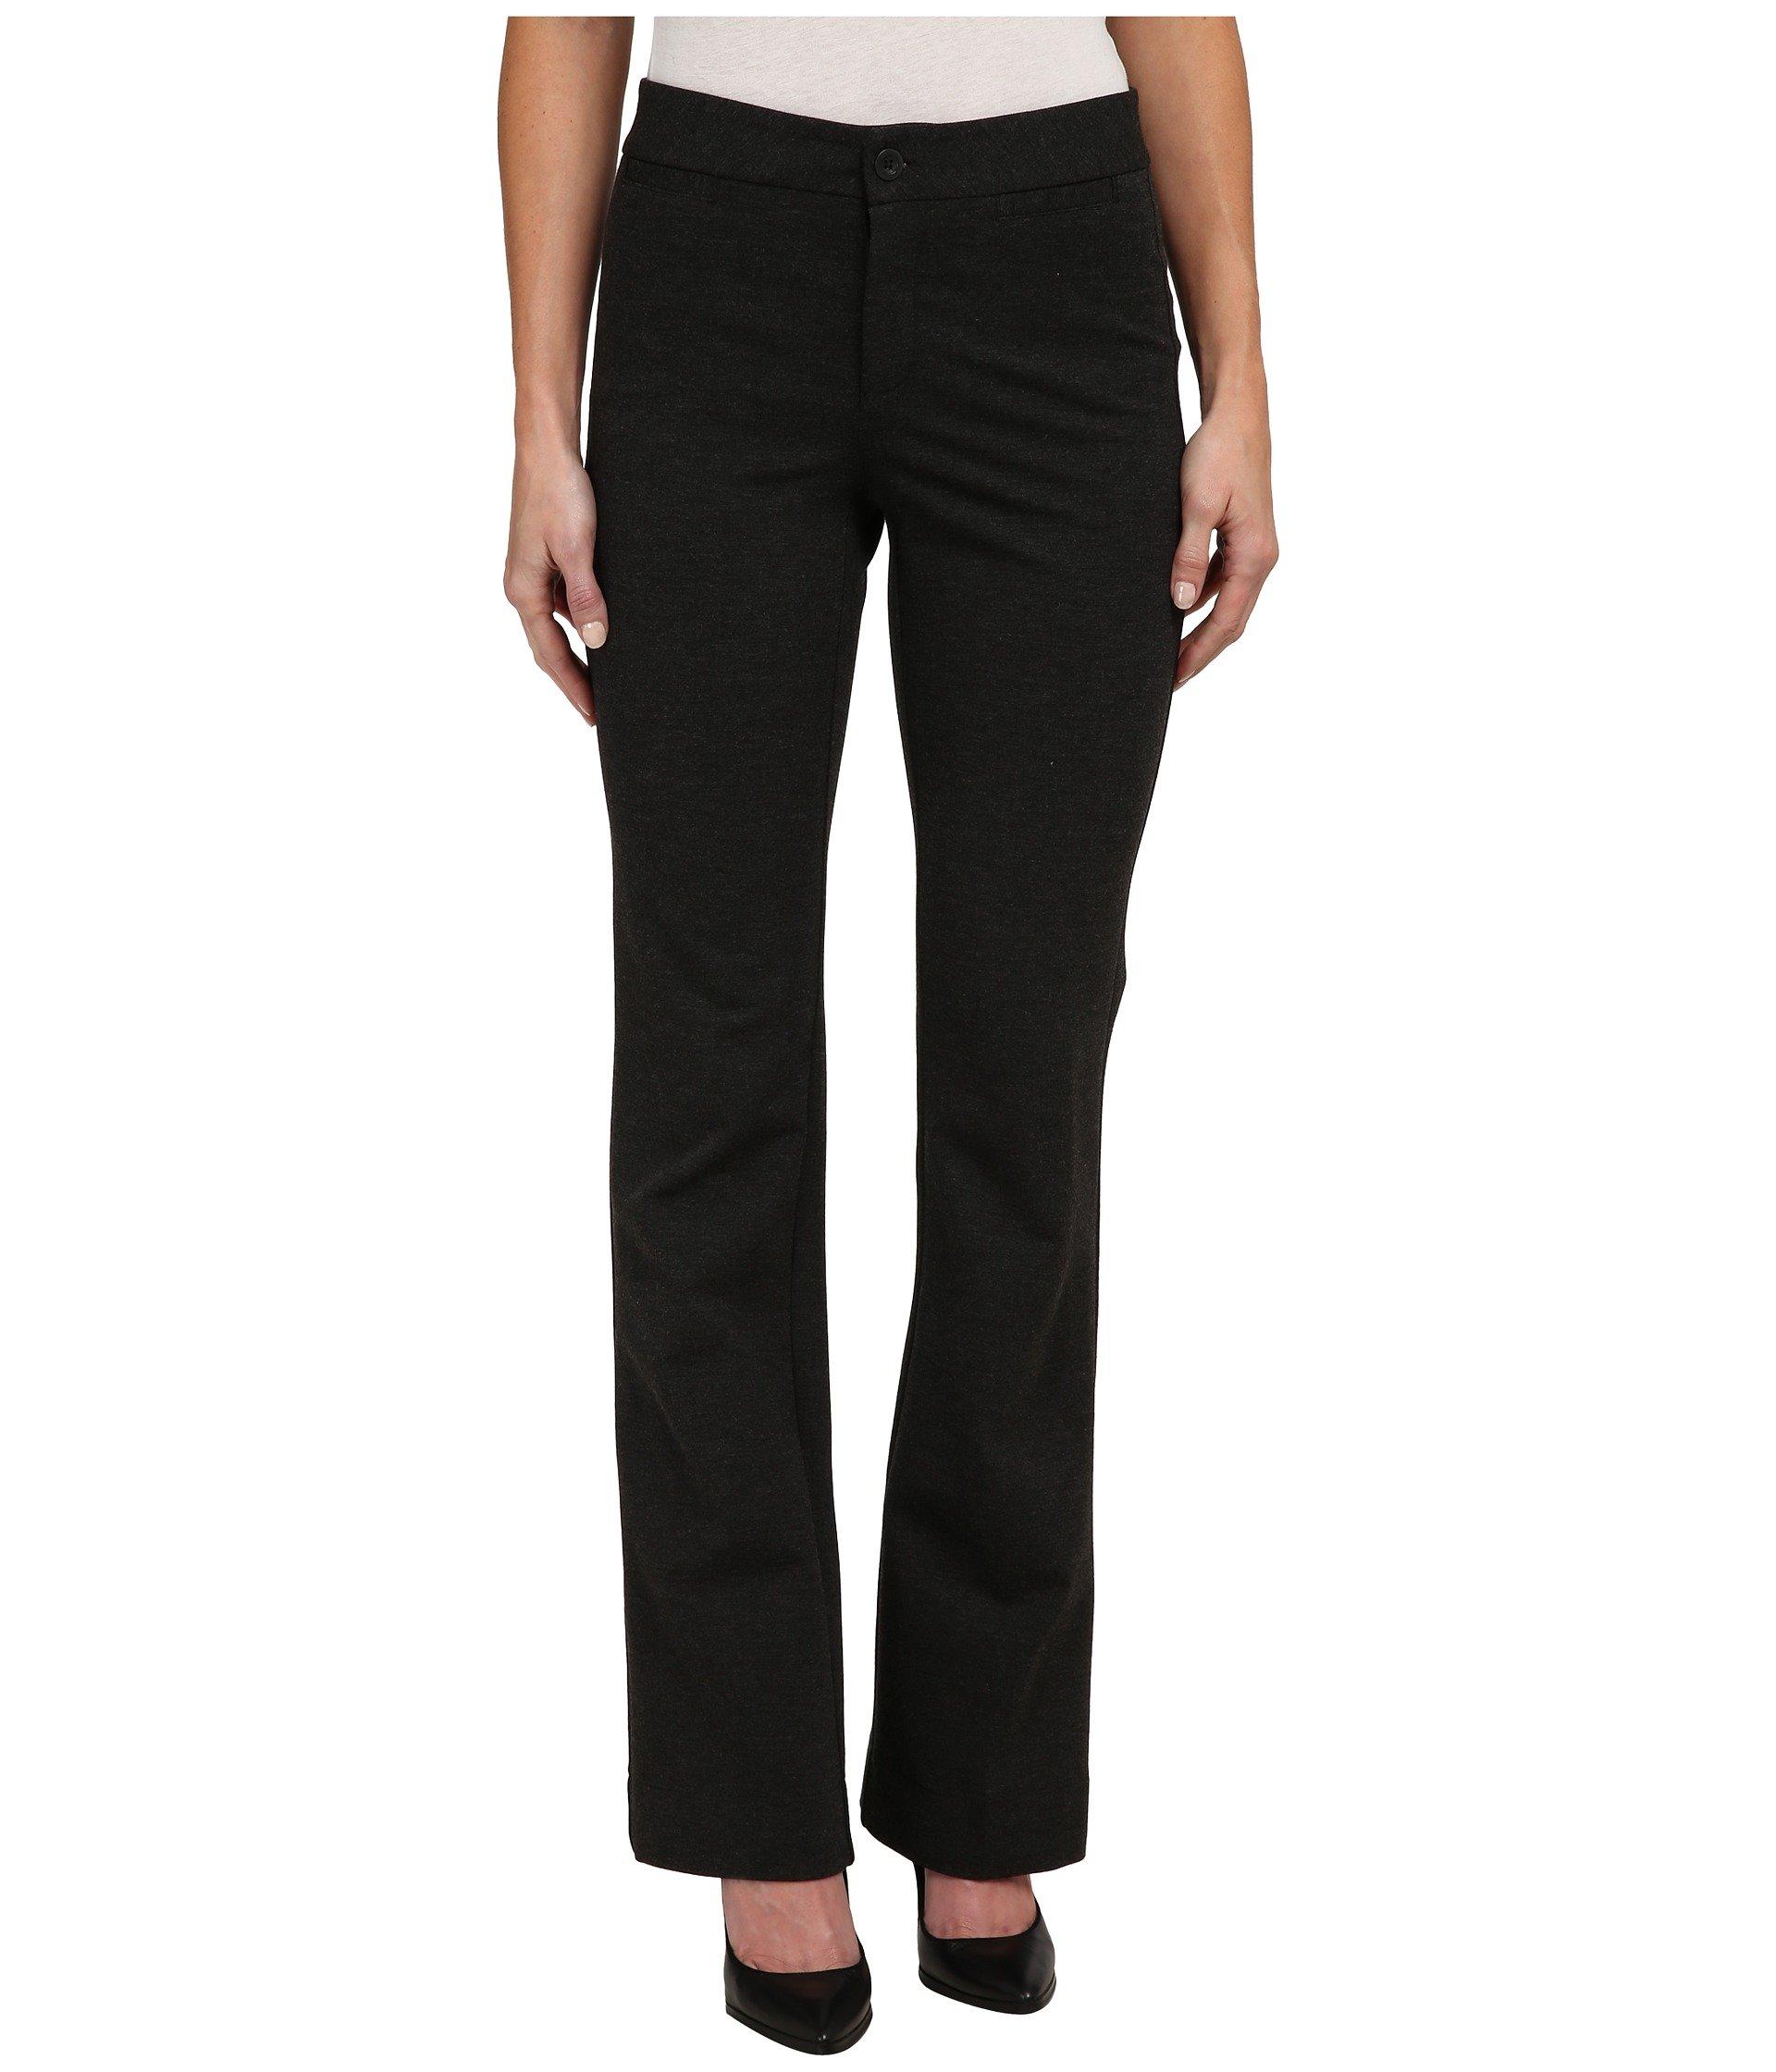 NYDJ Women's Michelle Ponte Trouser Charcoal Pants 8 X 33